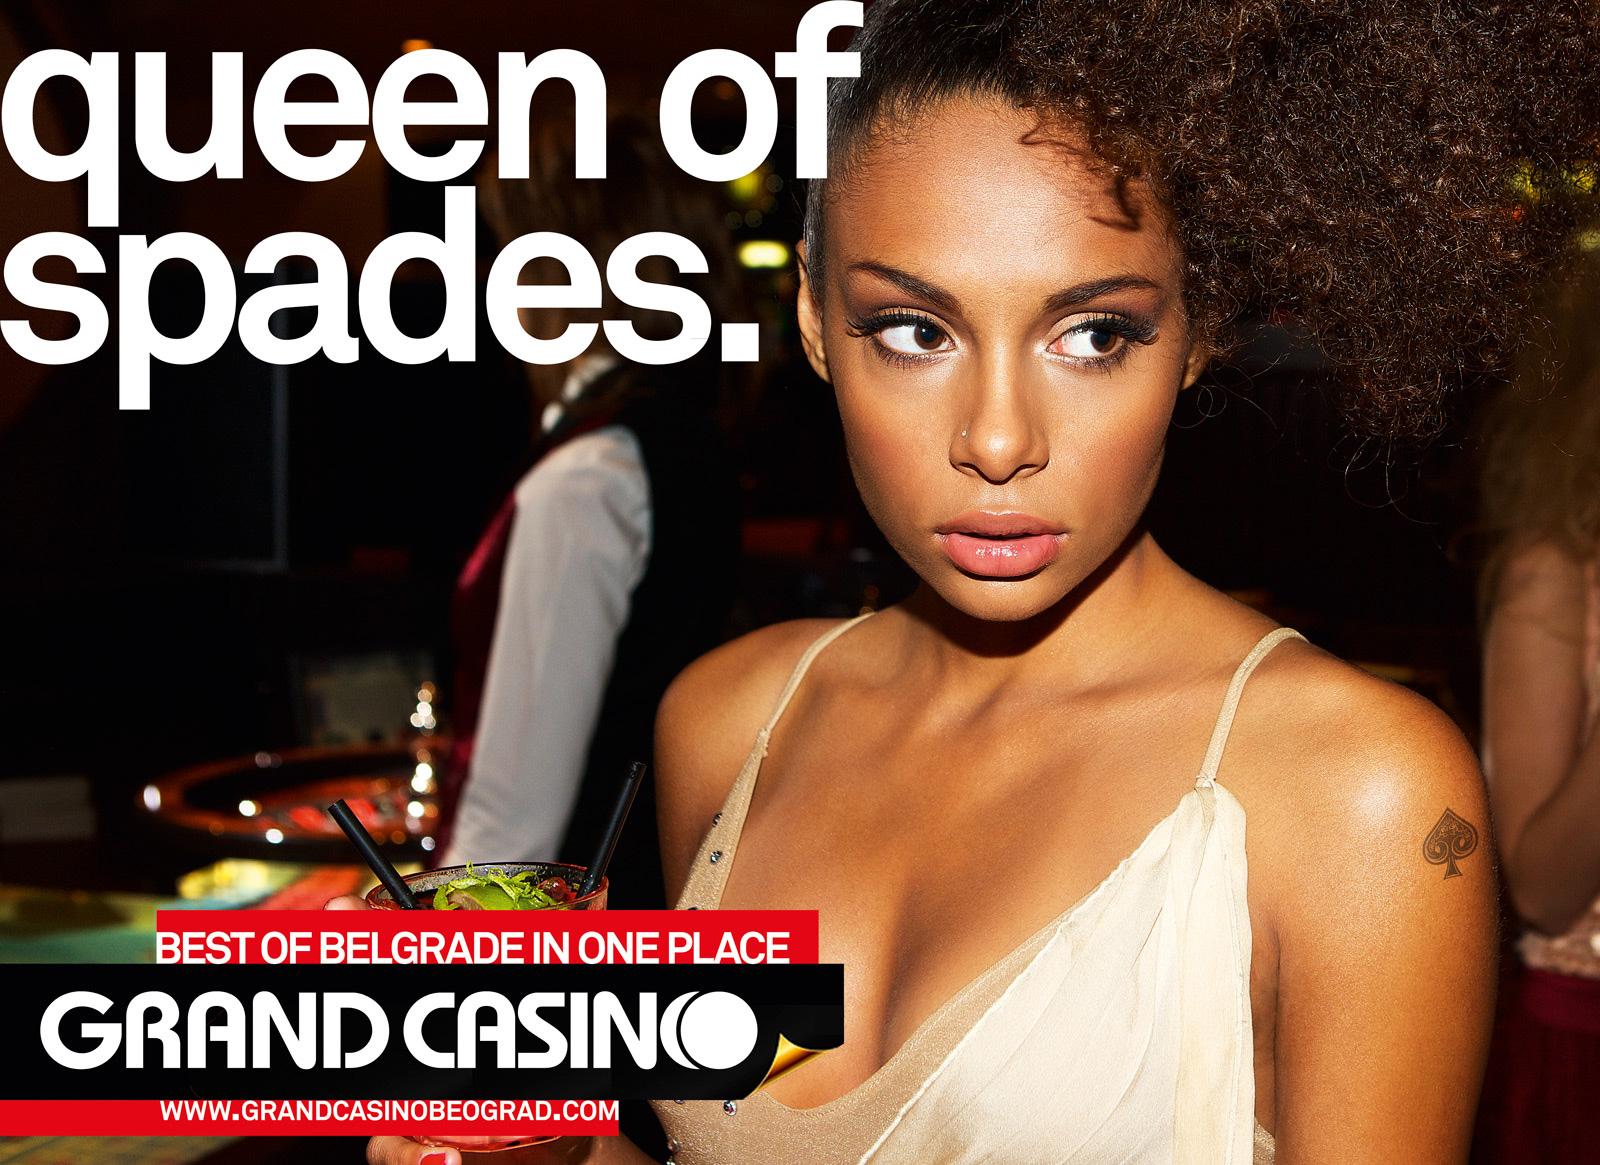 casino stereotypes